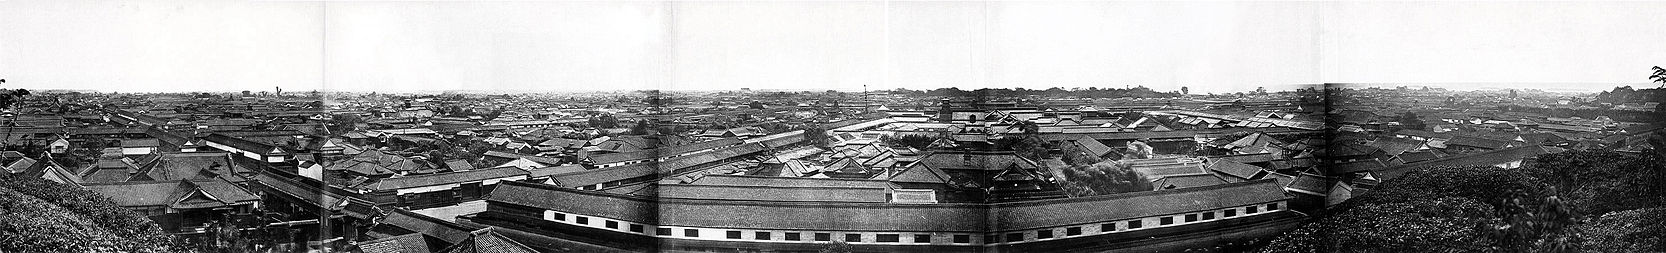 Edo, 1865 or 1866. Five albumen prints joined to form panorama. Photographer: Felice Beato